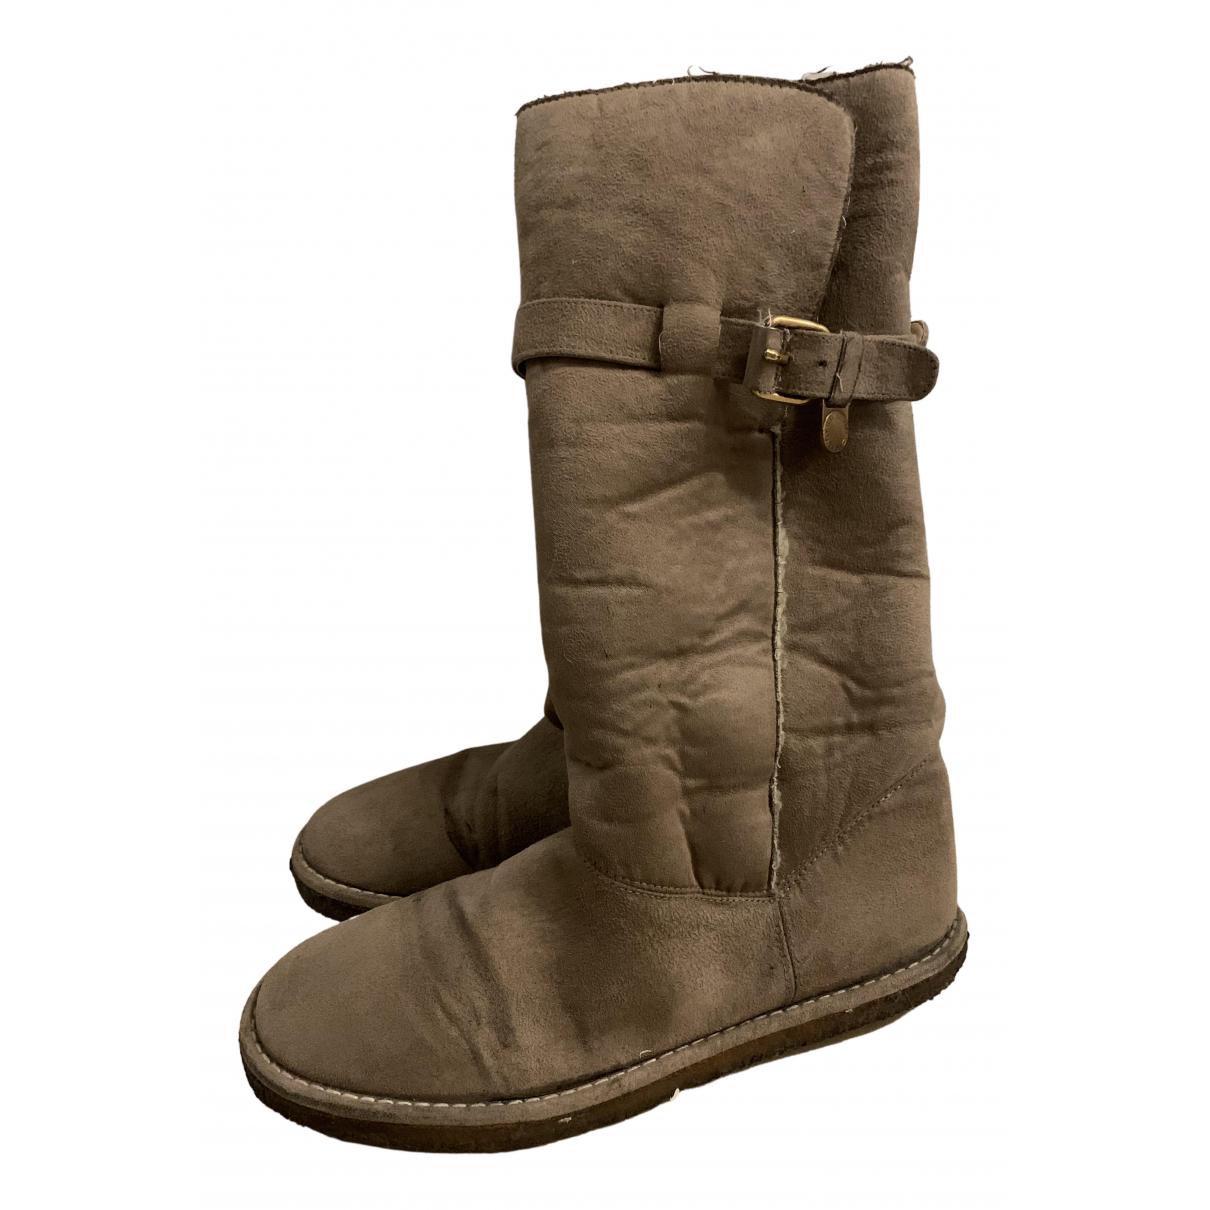 Stella Mccartney N Beige Cloth Boots for Women 40 IT